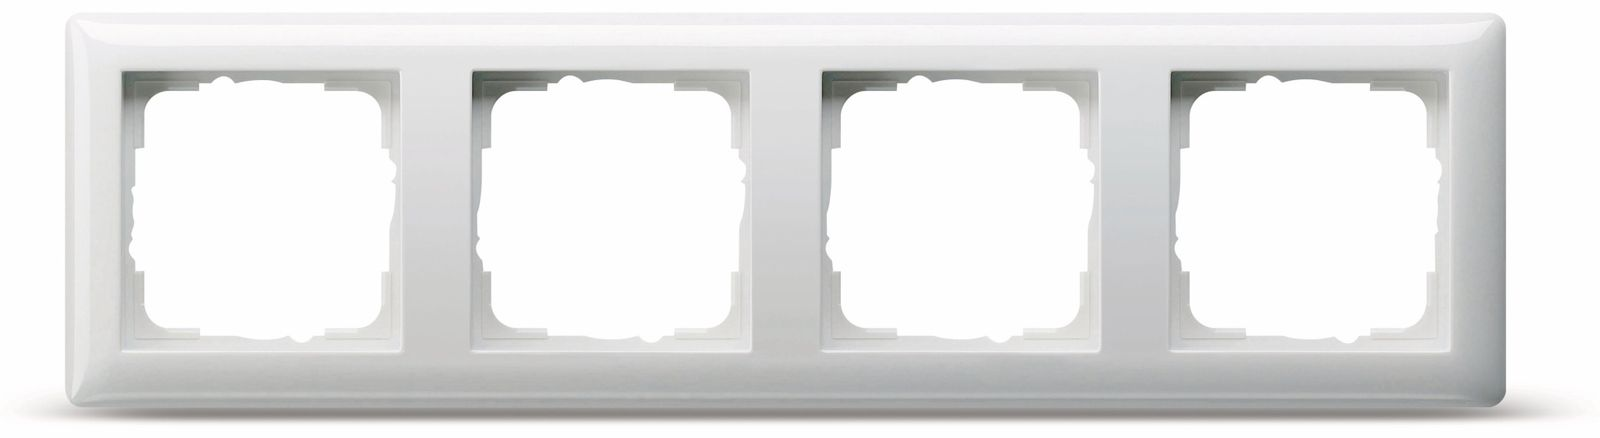 abdeckrahmen 4 fach gira standard 55 021403 reinwei. Black Bedroom Furniture Sets. Home Design Ideas